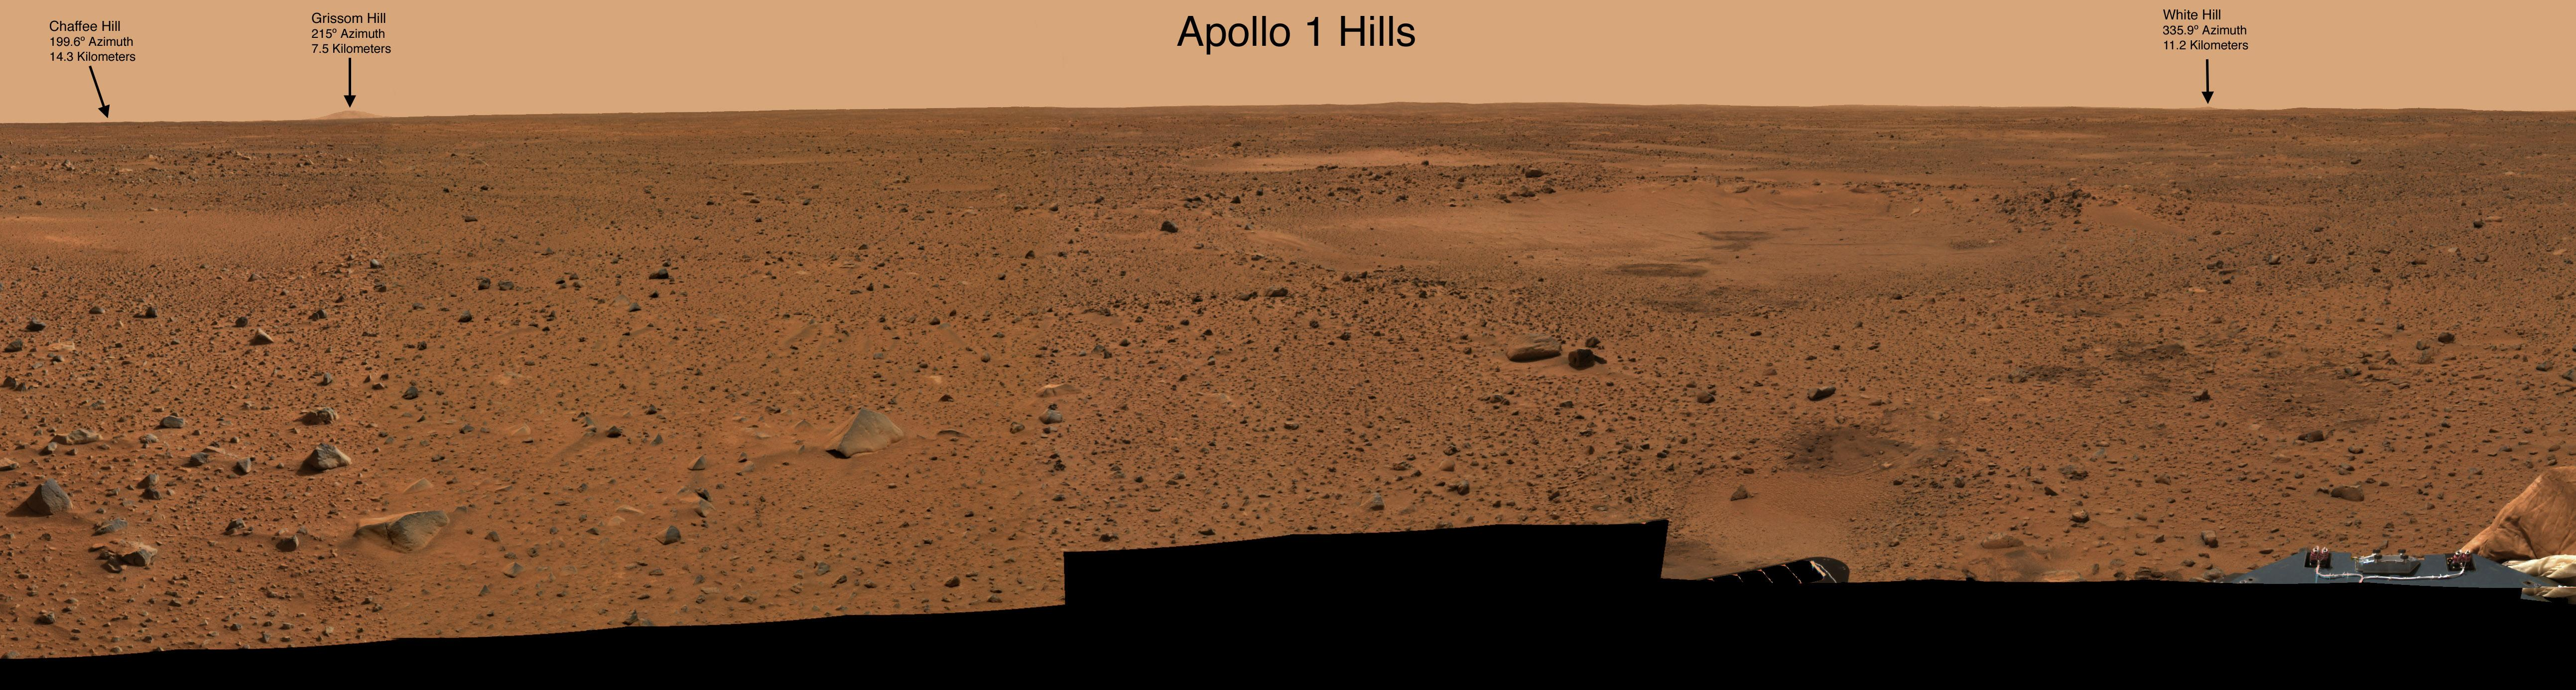 Mars Apollo 1 Hills